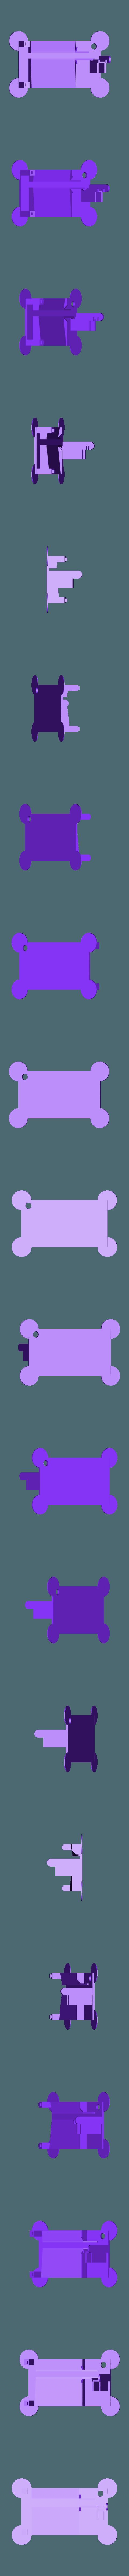 "Track_Base.stl Download free STL file Marblevator ""Mini"", Zigzag Edition Track • 3D print design, gzumwalt"